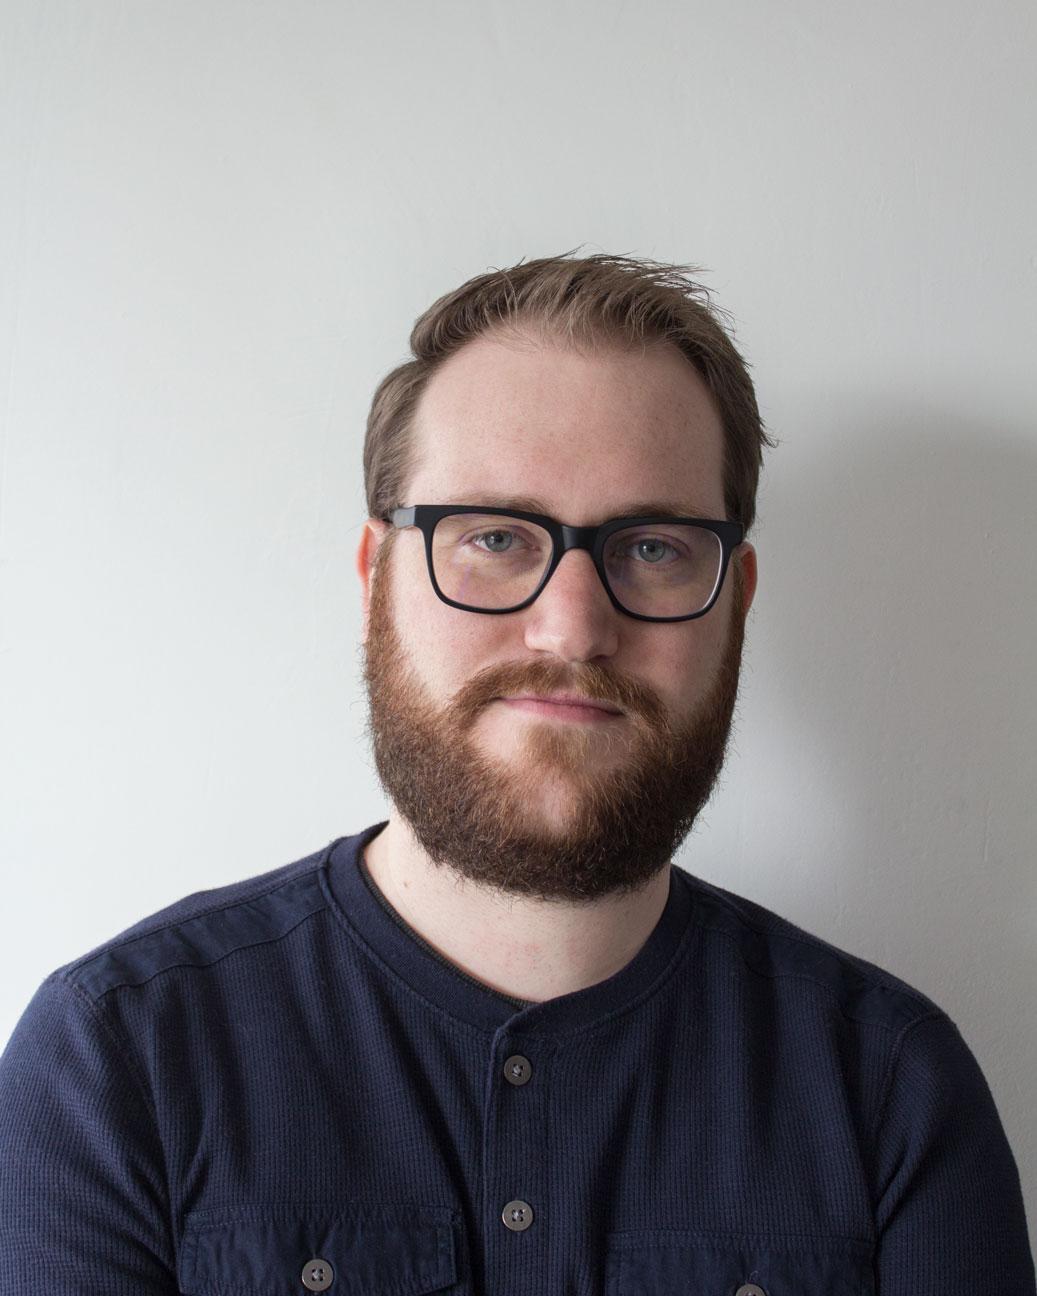 Roy - Roy Lardenoije, PhD - BioinformaticianResearchGate | NCBI | Email